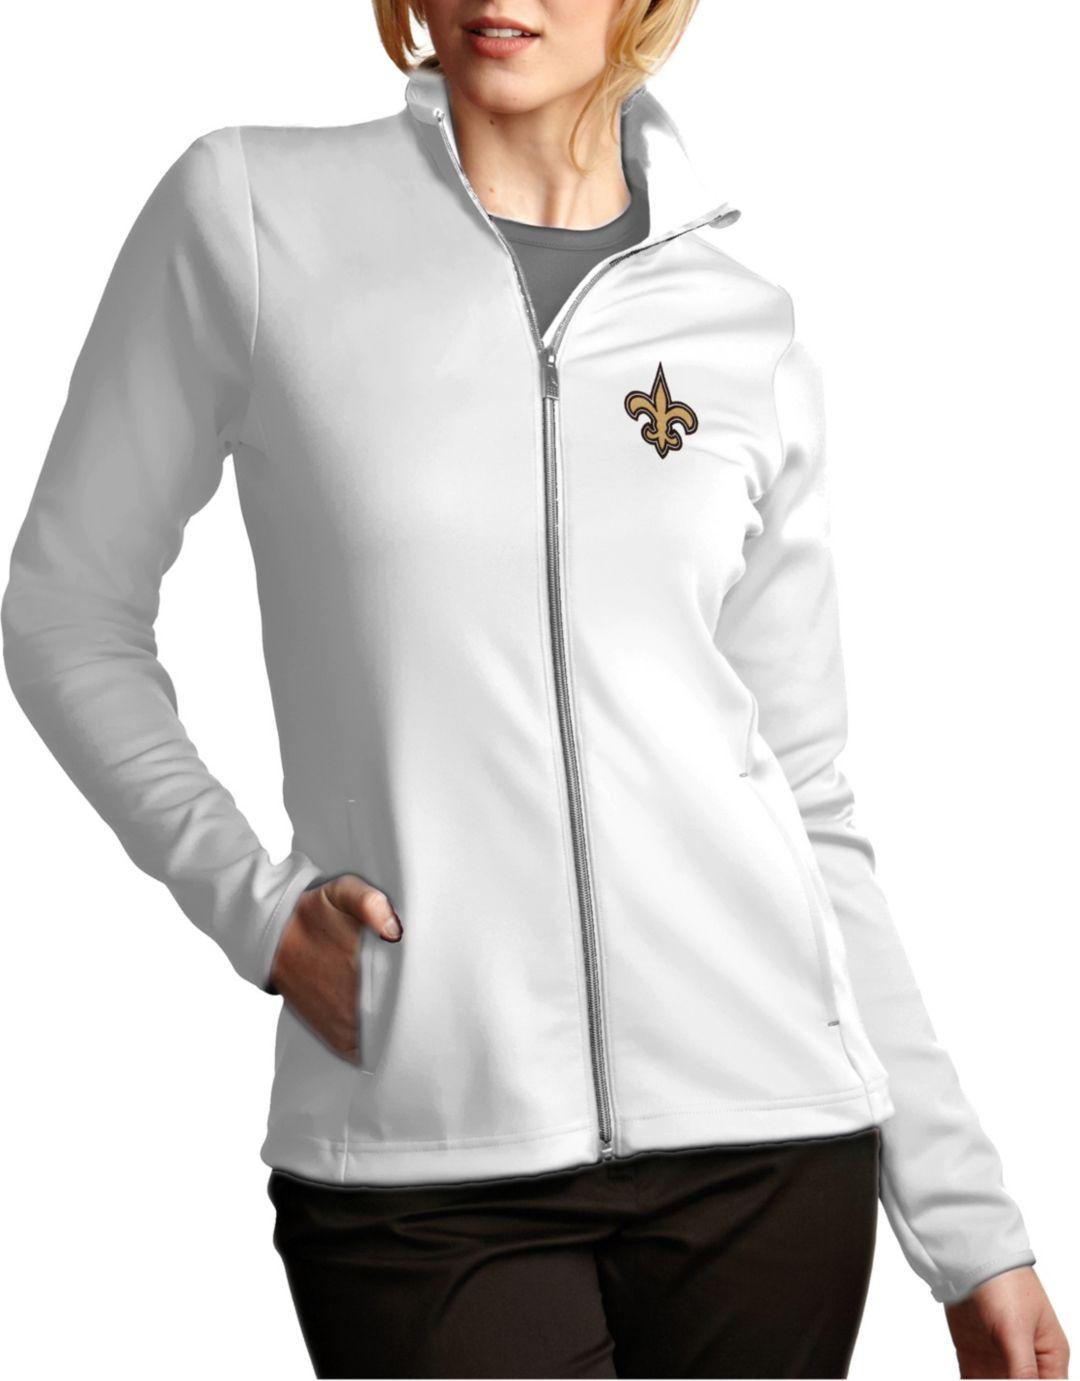 a81b89a8 Antigua Women's New Orleans Saints Leader Full-Zip White Jacket